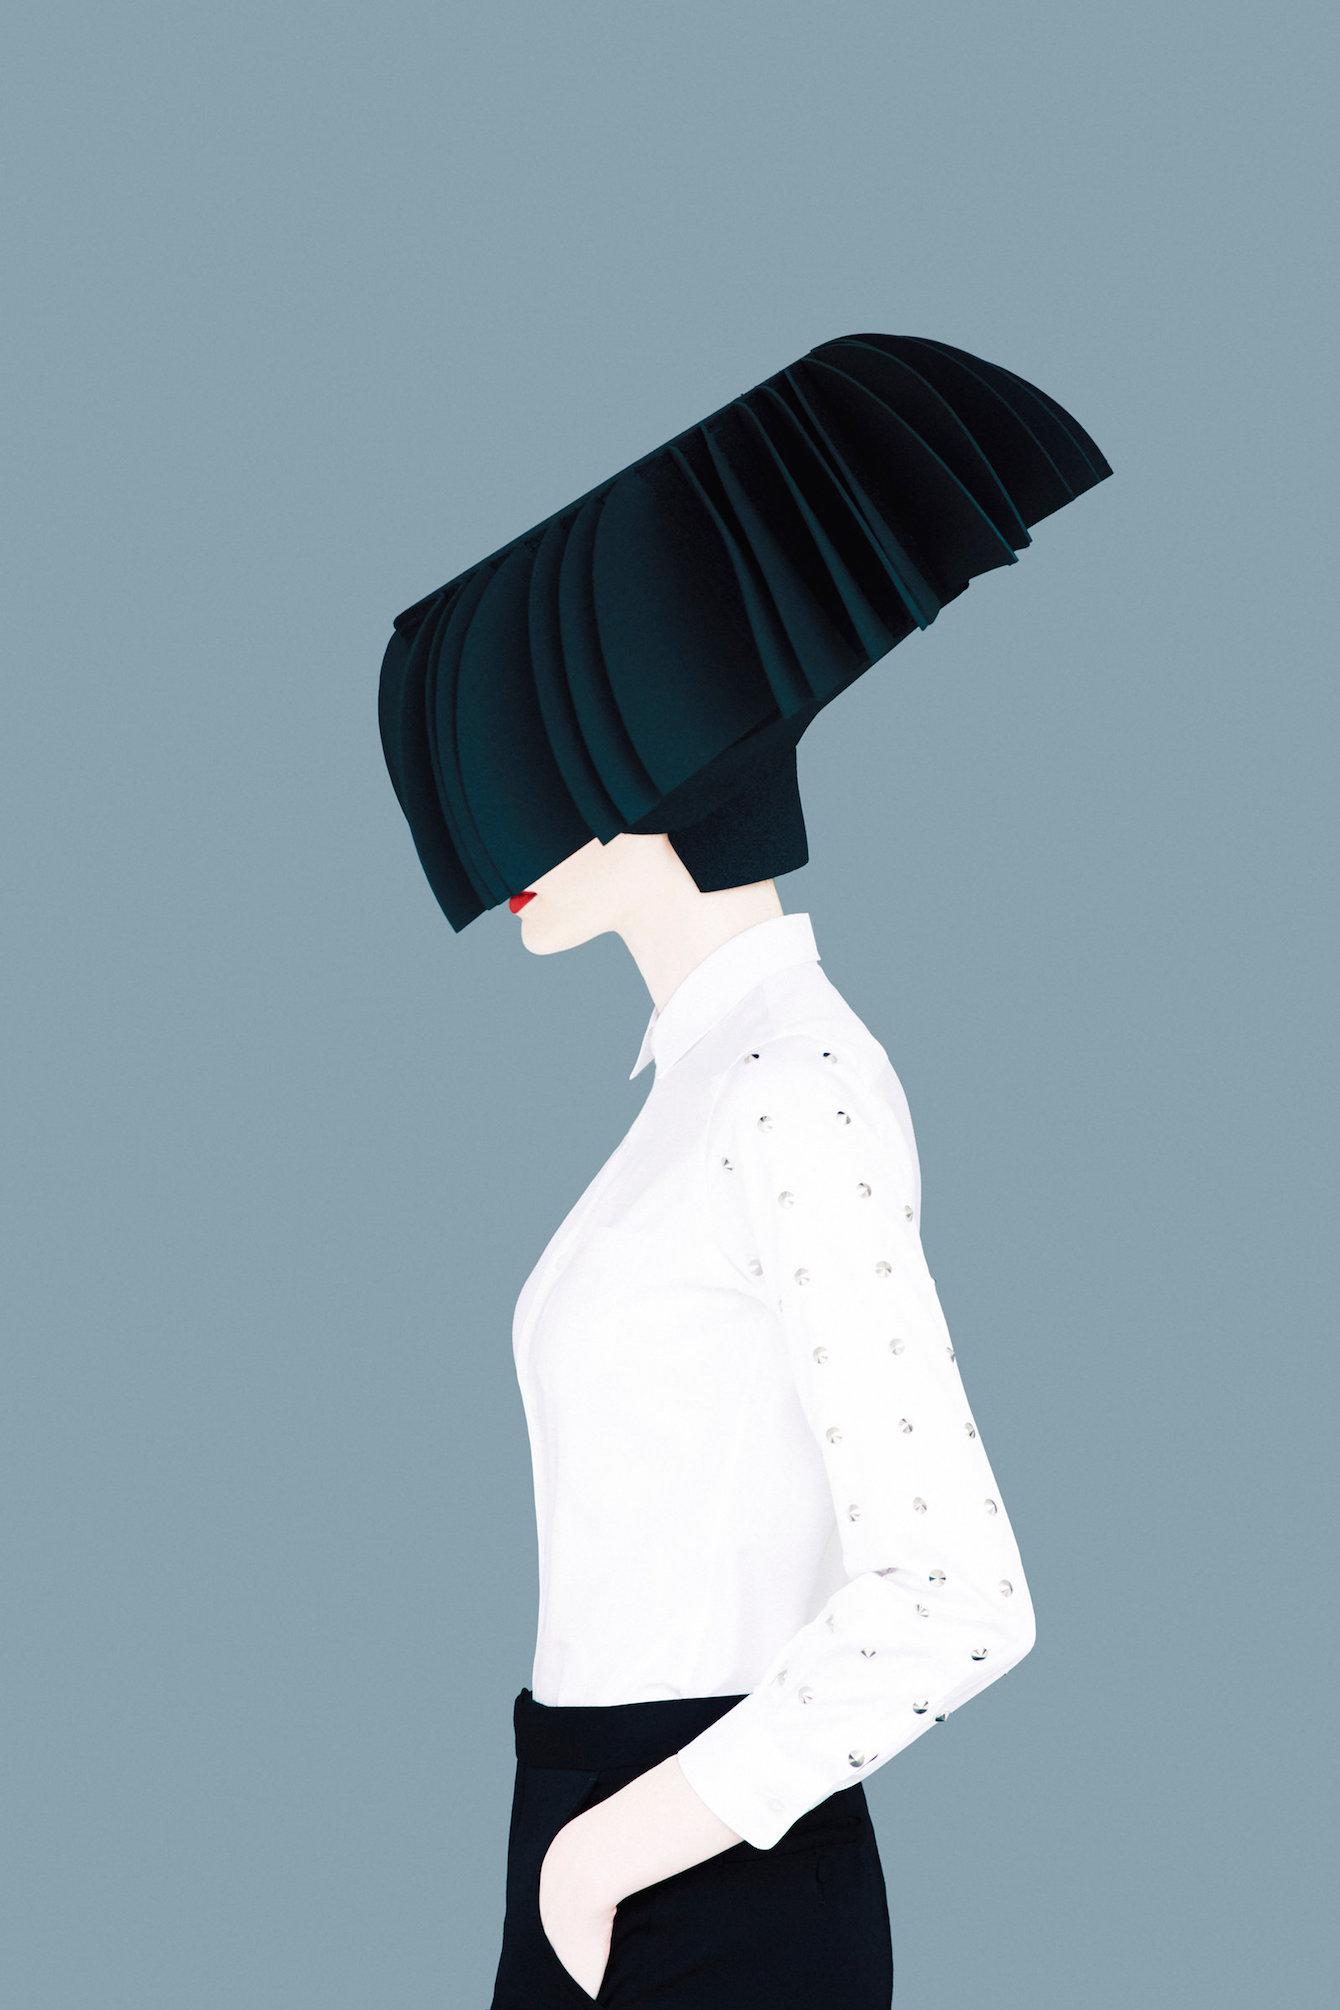 Striking Fashion Portraits By Erik Madigan Heck Ignant Com